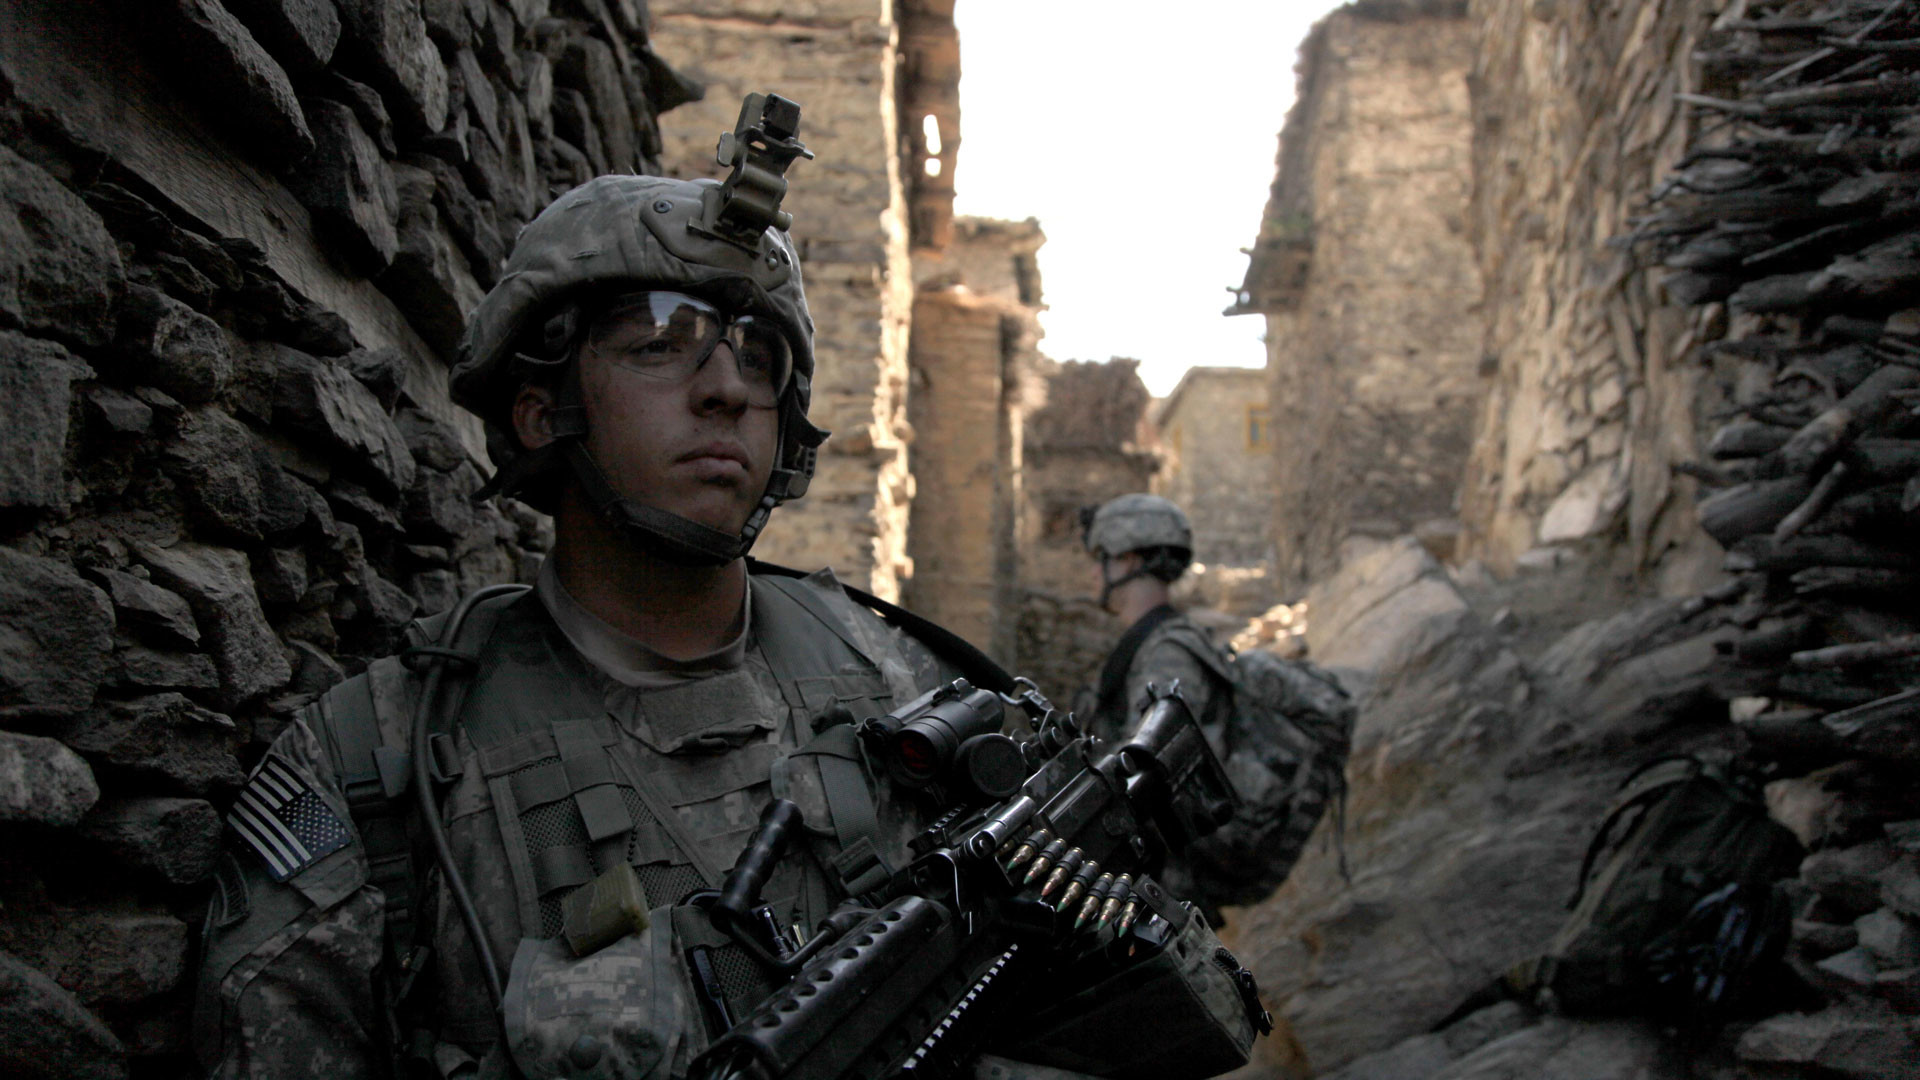 Фото: © flickr / The U.S. Army